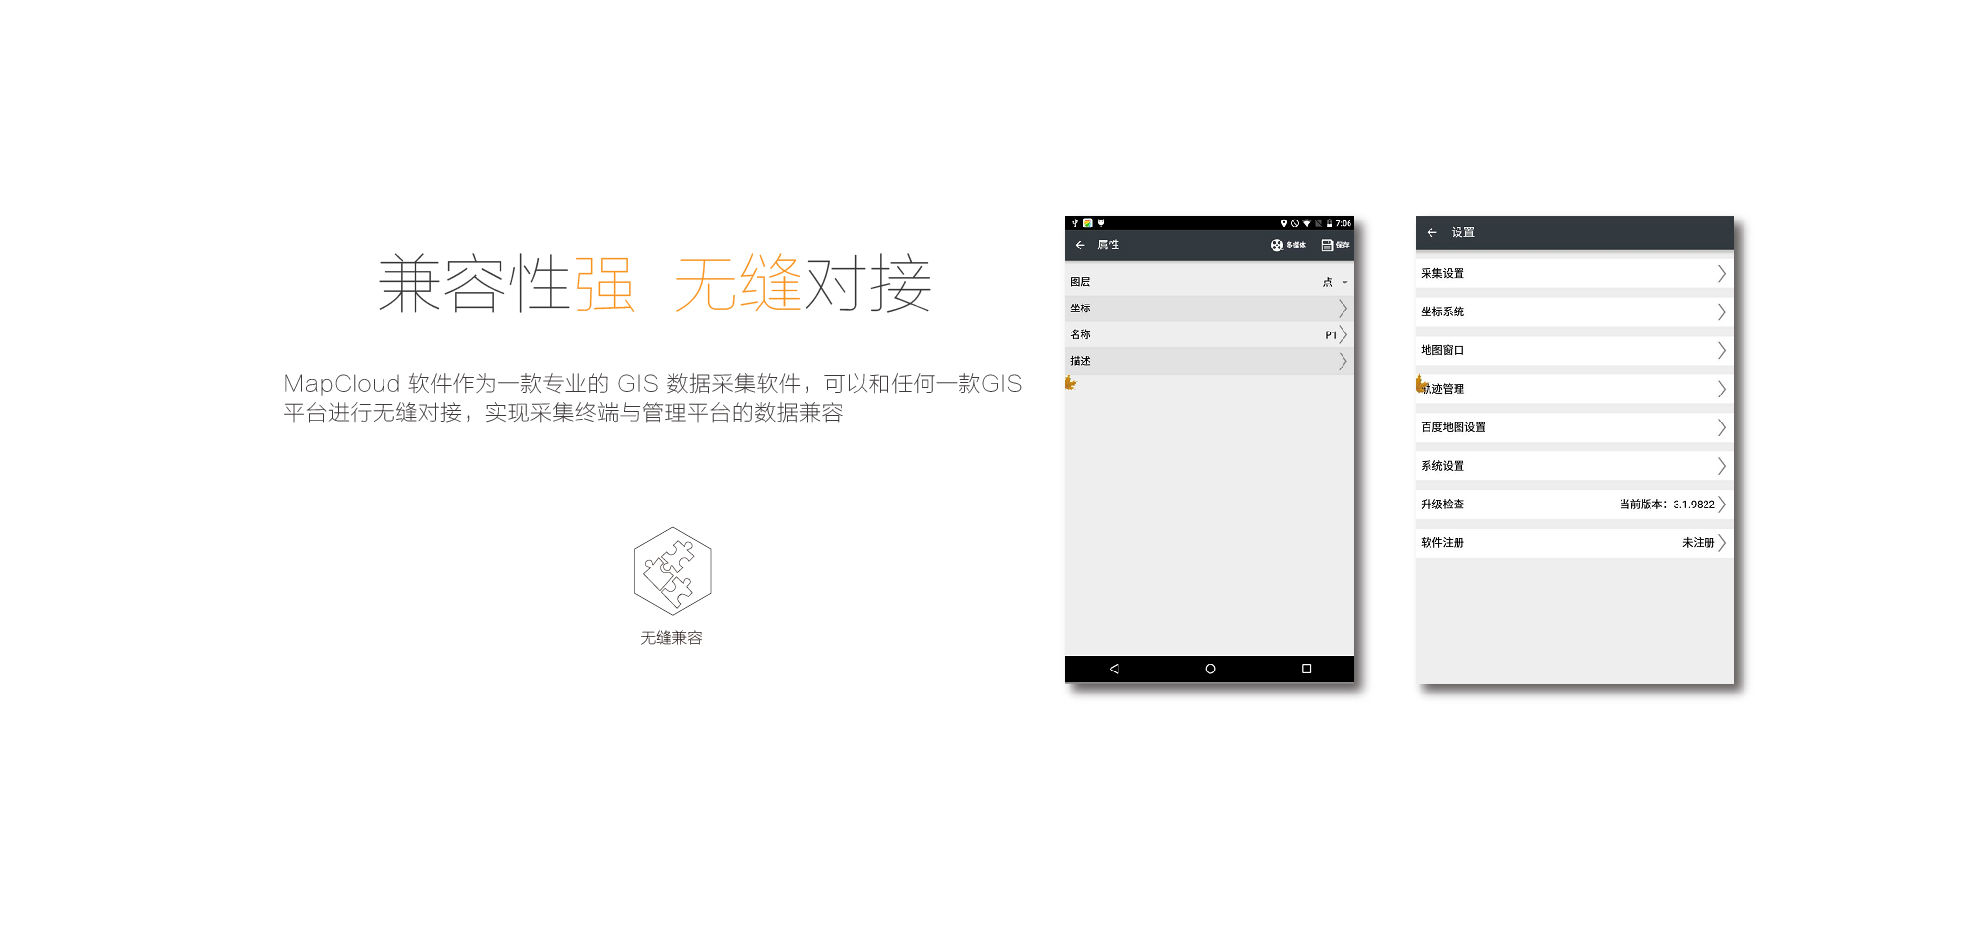 華測導航Android雲圖3.0 GIS數據采集軟件系統,移動端GIS數據采集軟件,兼容性強,無縫對接